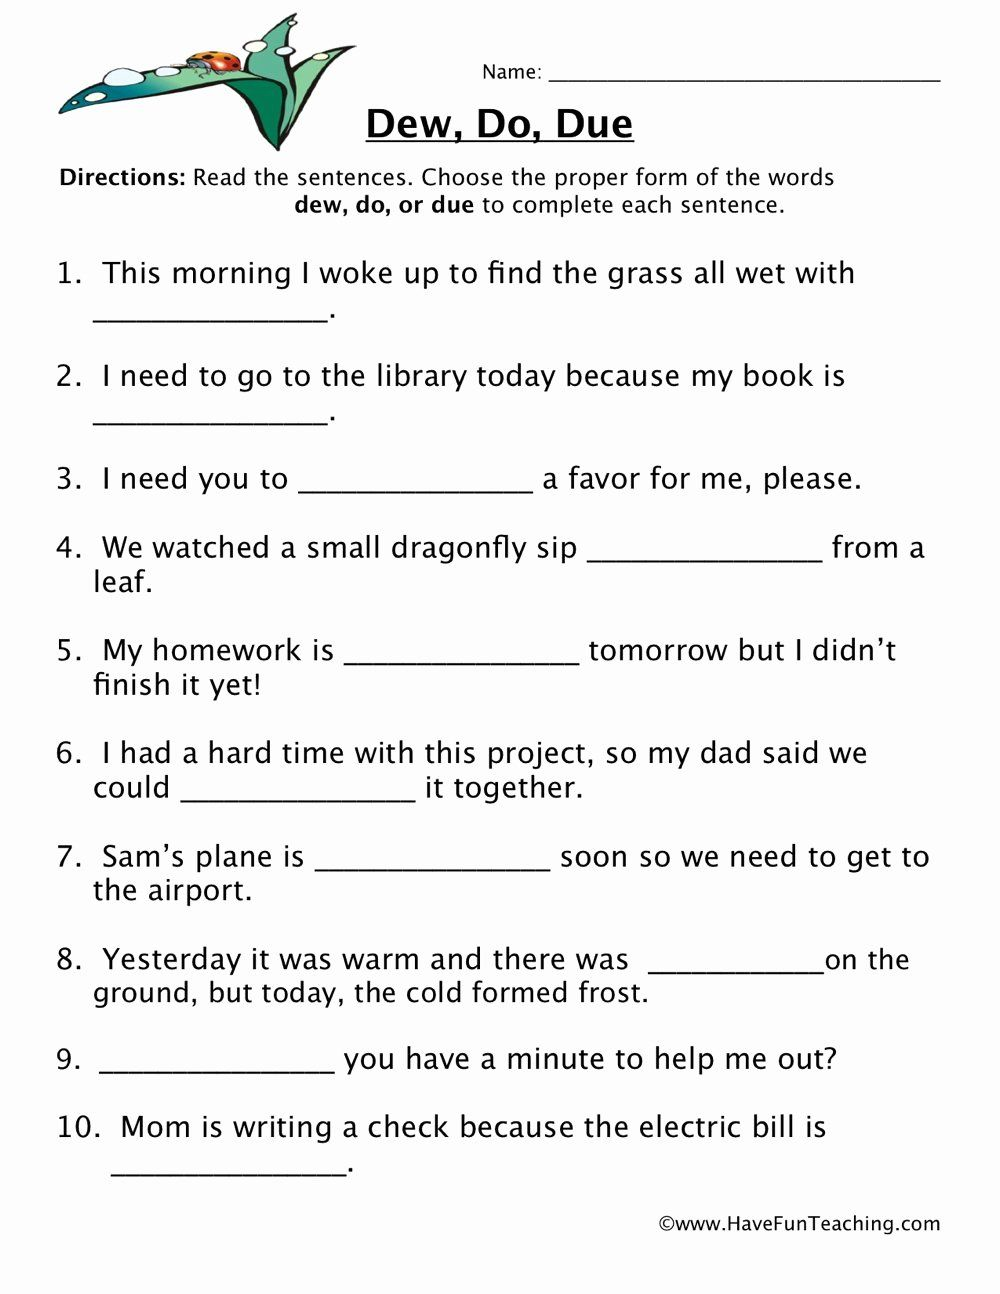 Homophone Worksheets 5th Grade Inspirational Dew Do Due Homophones Worksheet In 2020 Homophones Worksheets 5th Grade Worksheets 2nd Grade Worksheets